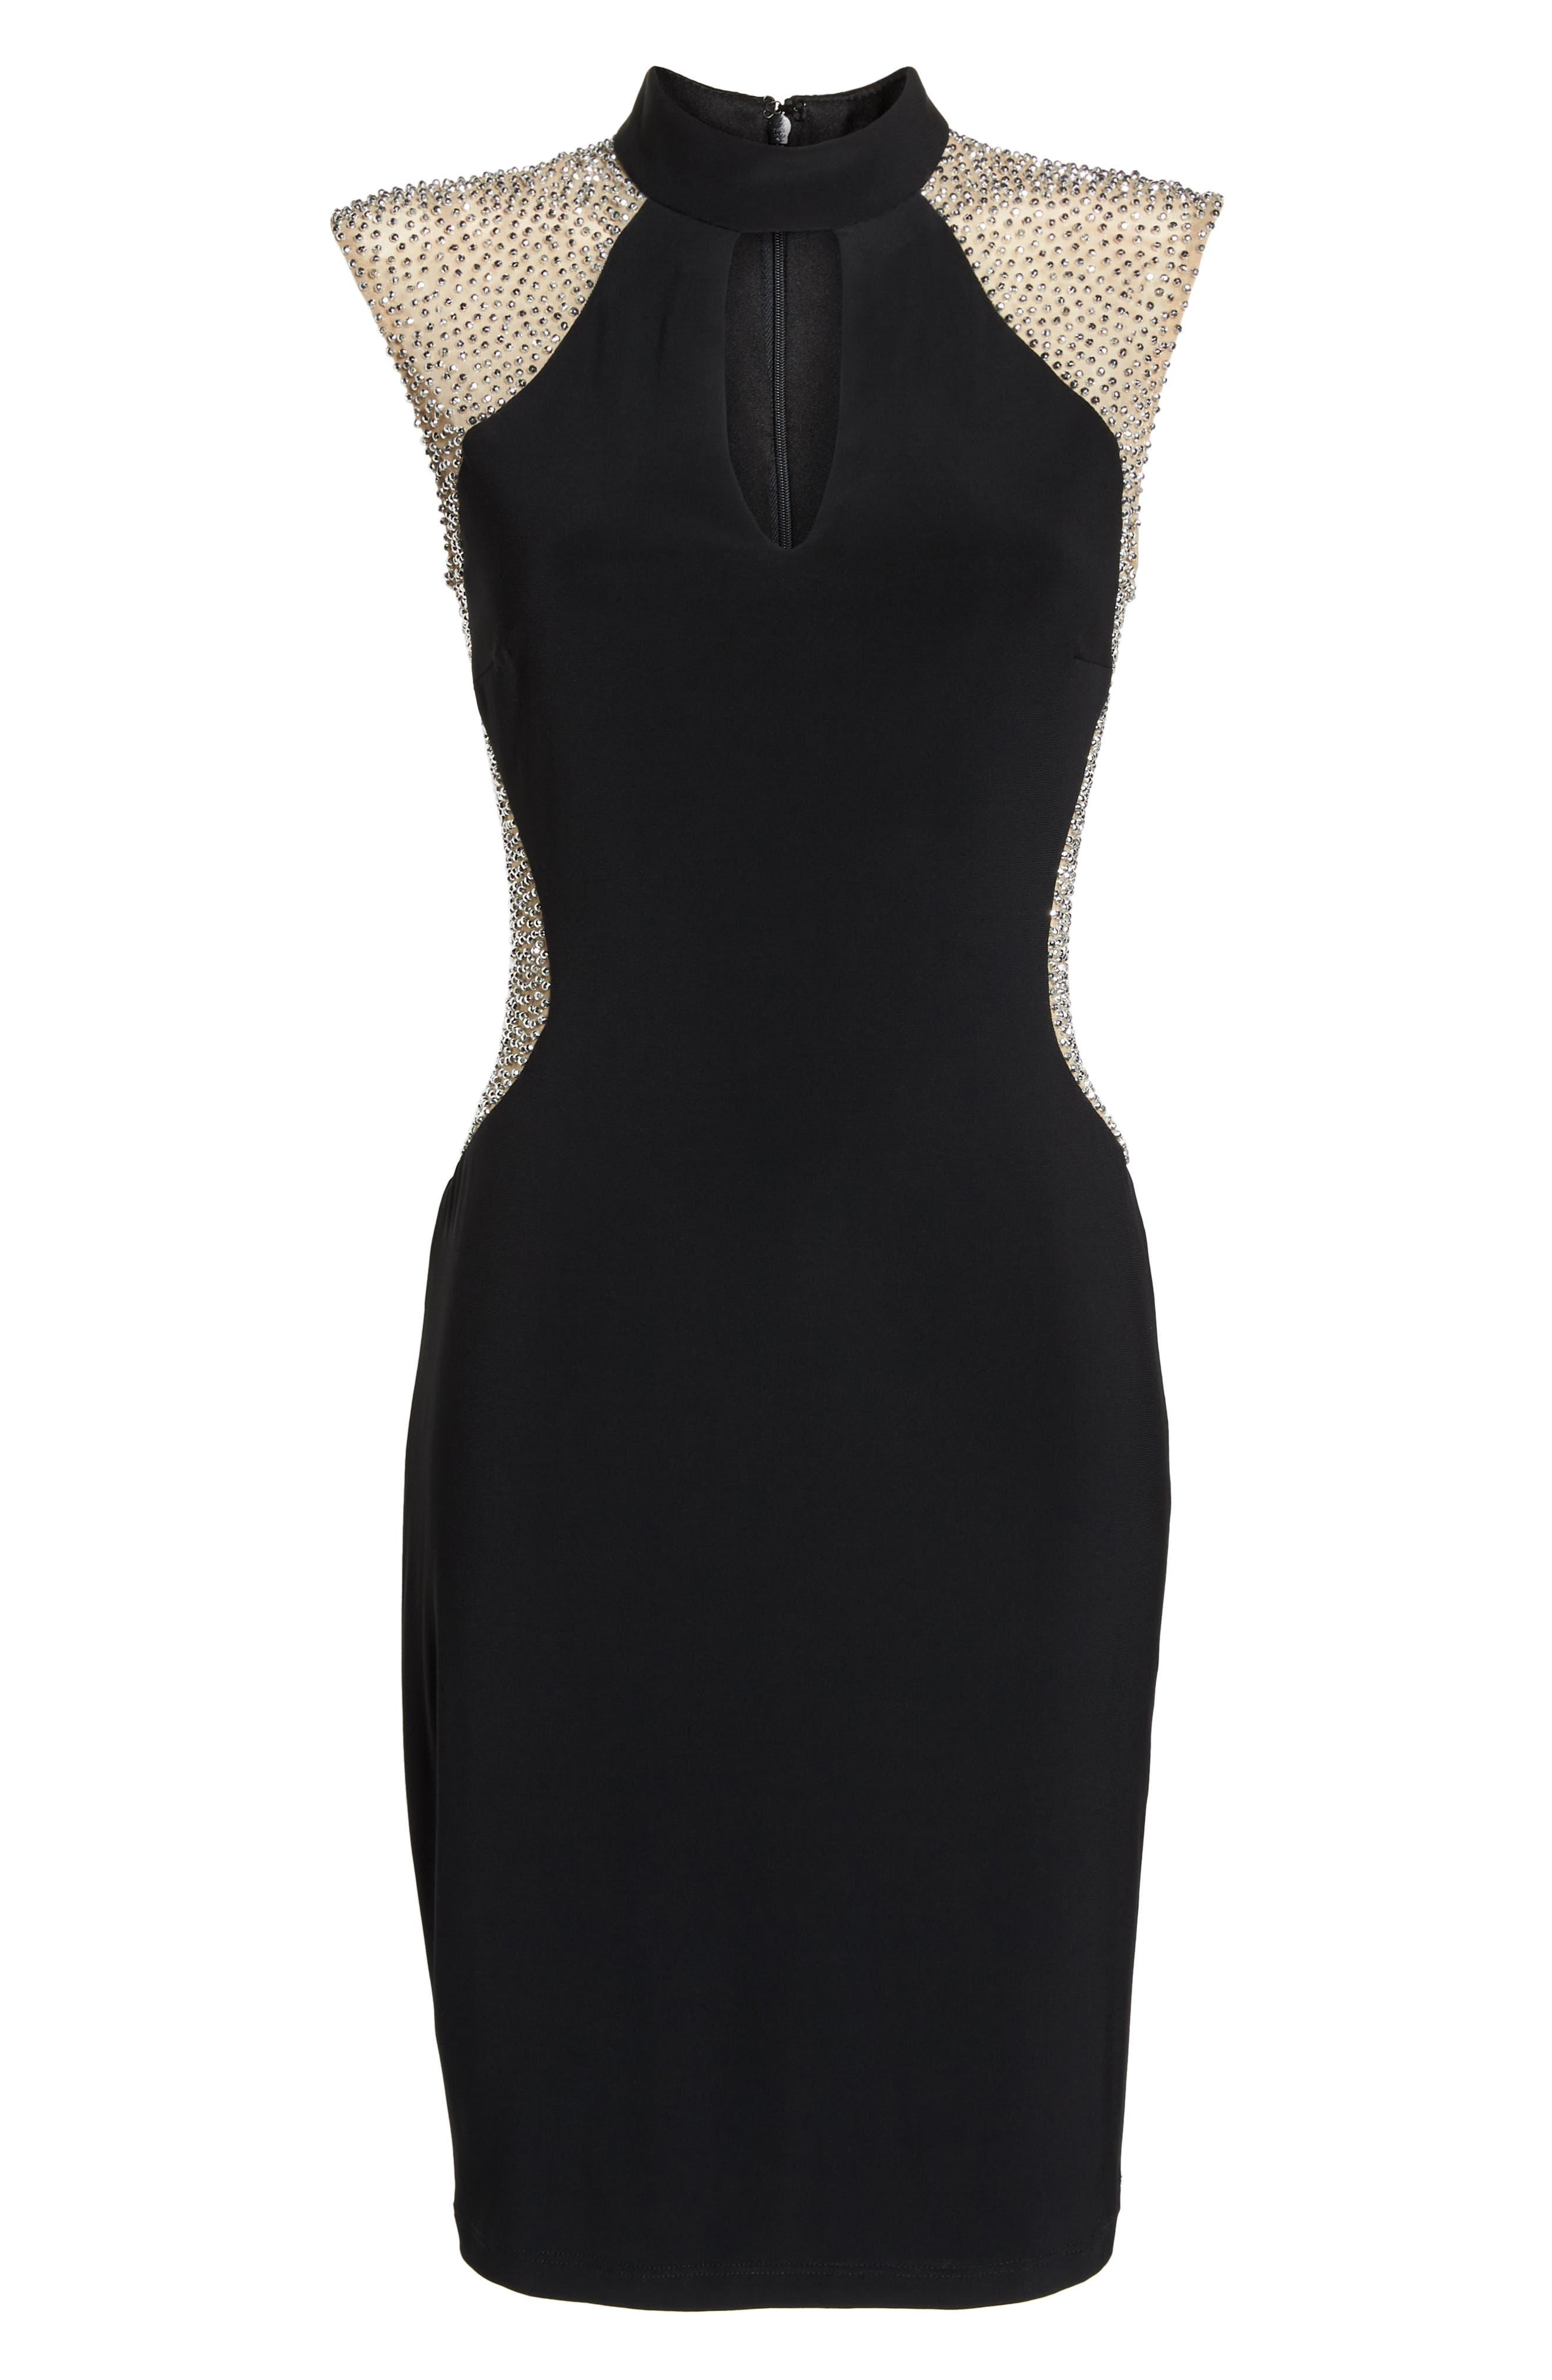 Caviar Beaded Keyhole Dress,                             Alternate thumbnail 7, color,                             BLACK/ NUDE/ SILVER